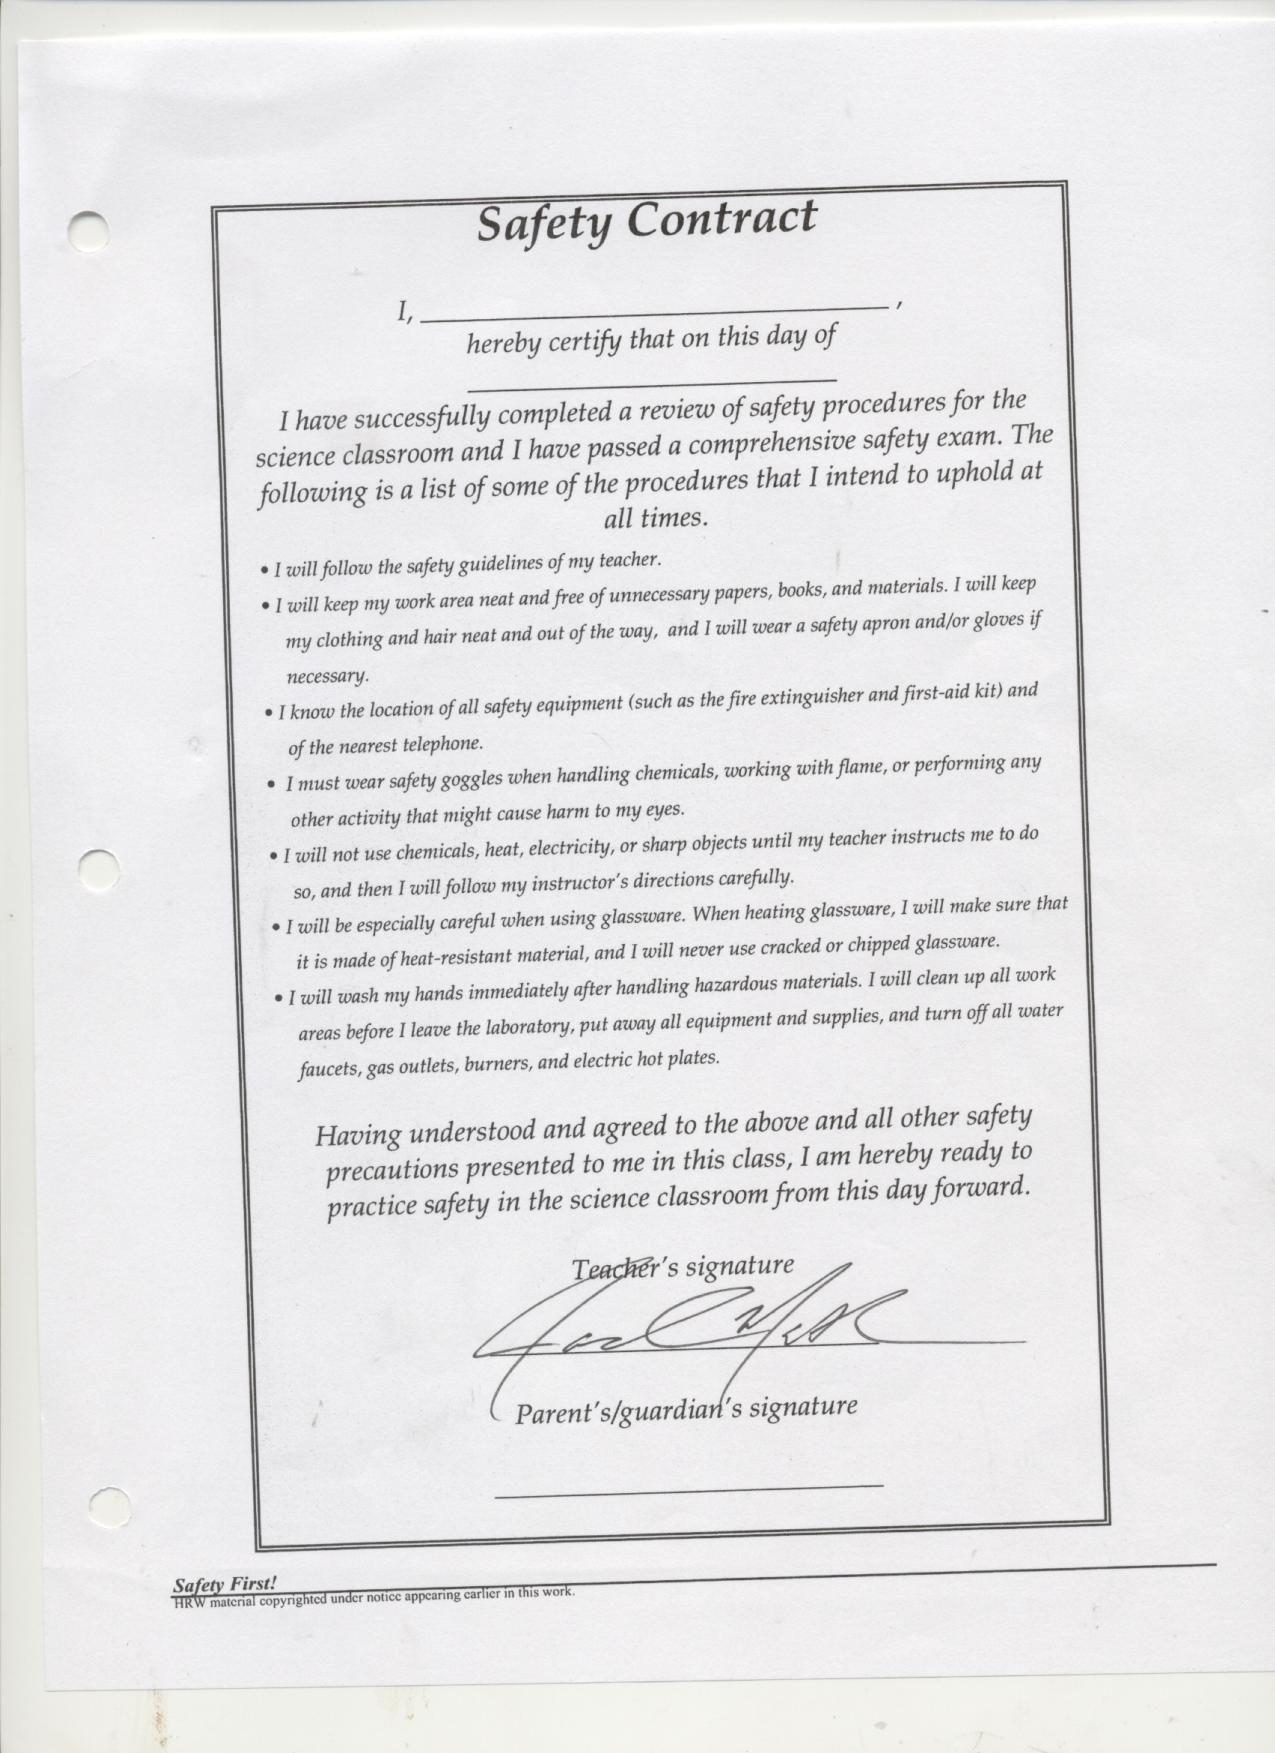 Mr. Mathews: Lab Safety Contract